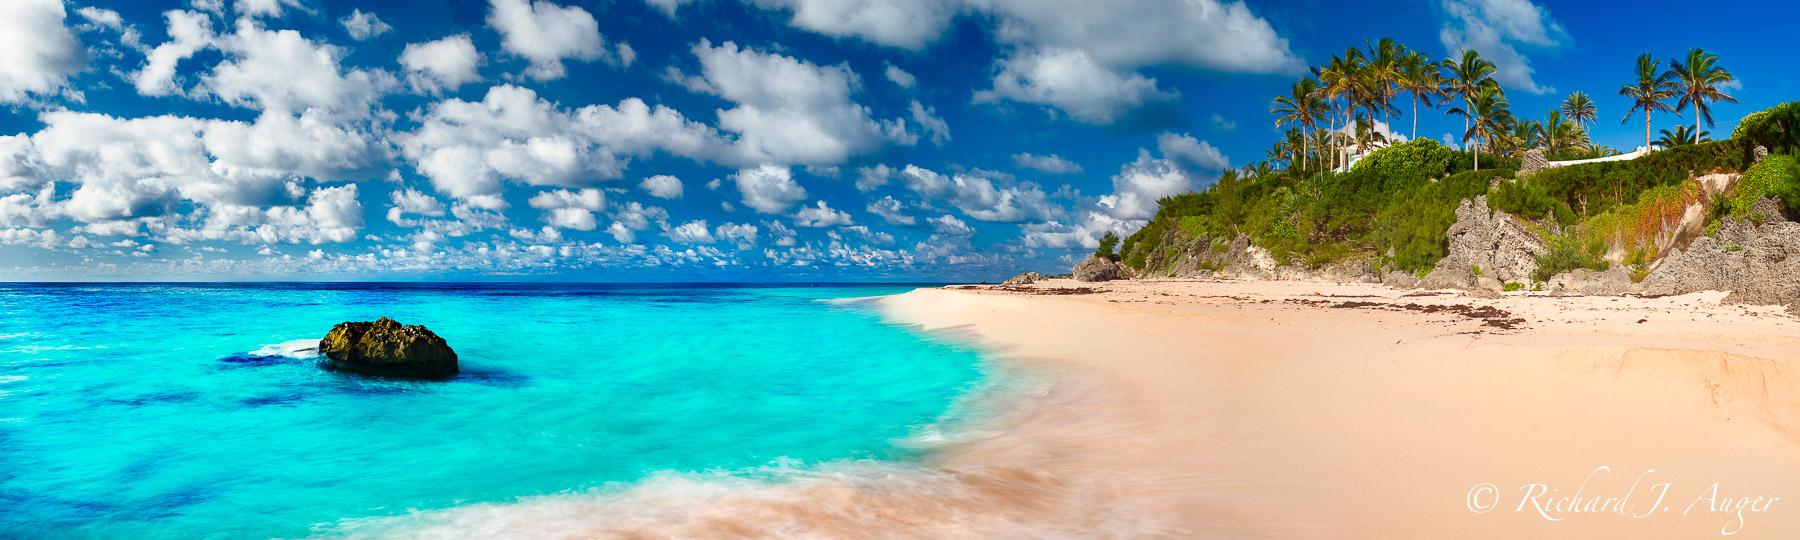 Warwick Bay, Bermuda, seascape, panorama, beach, clips, rocks, waves, ocean, palm trees, tropical, carribean, sunny, photograph